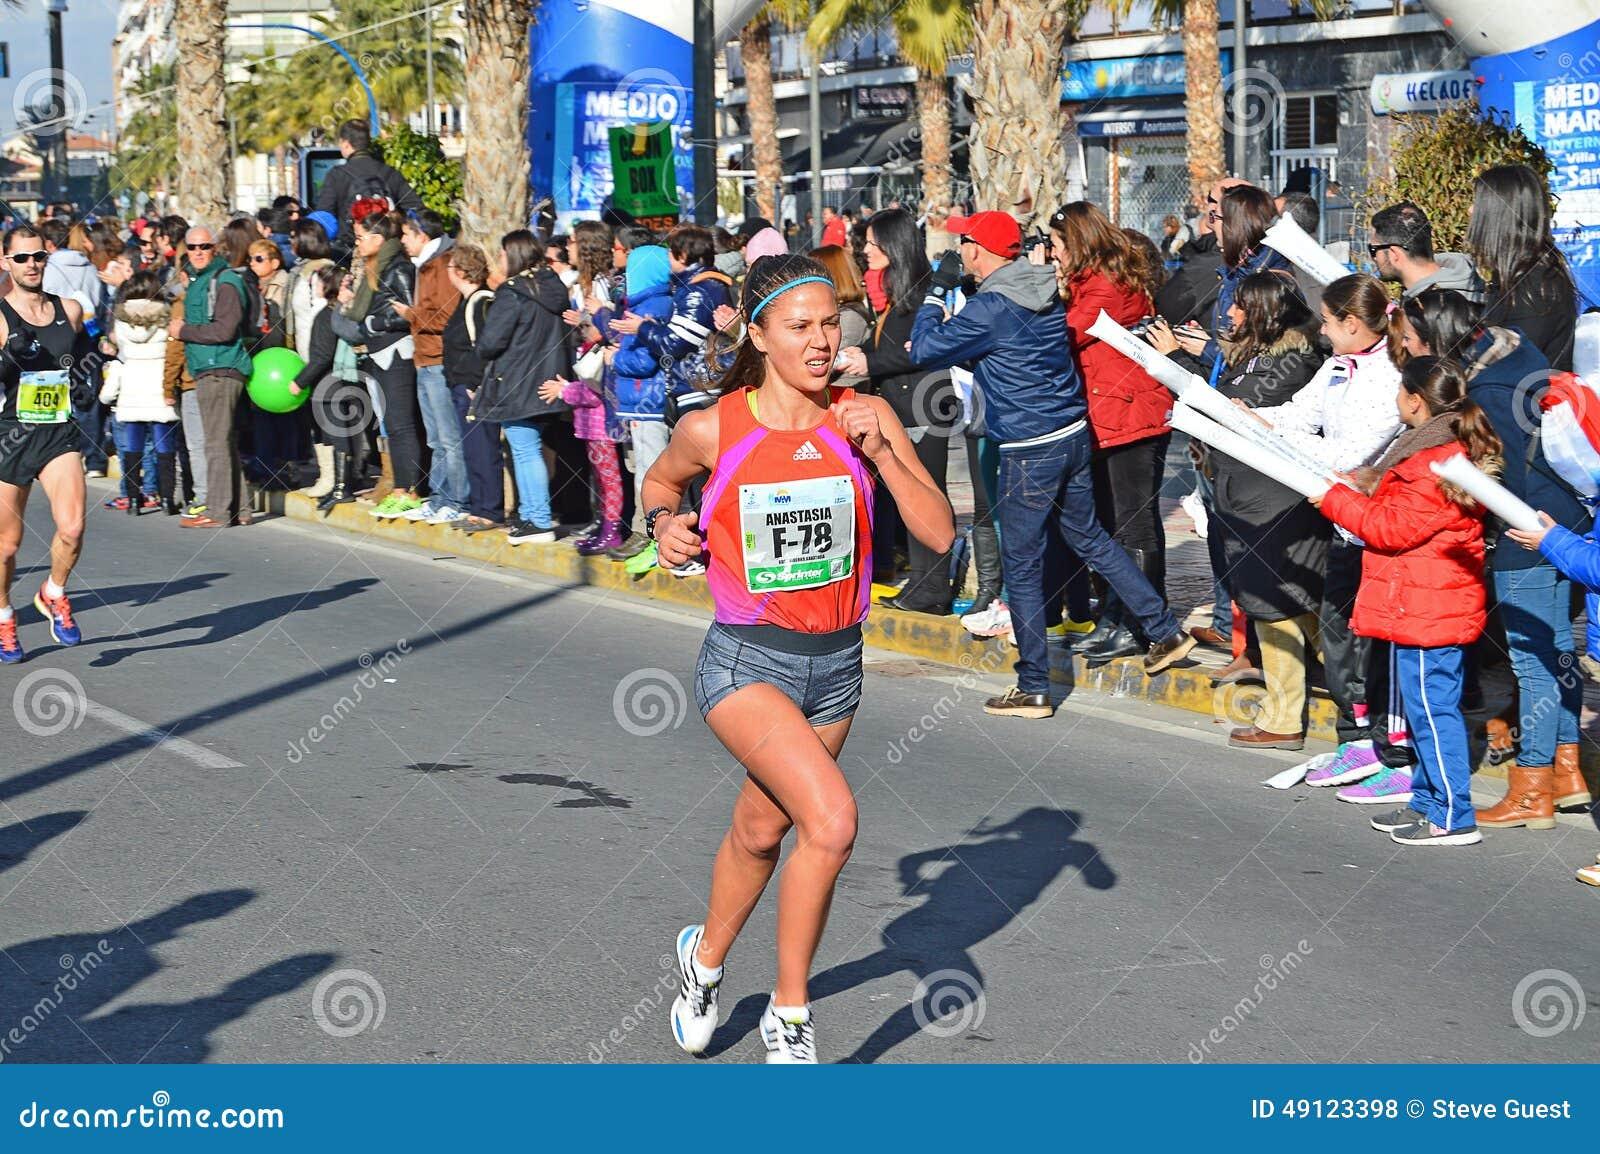 Woman Runner In Marathon Race